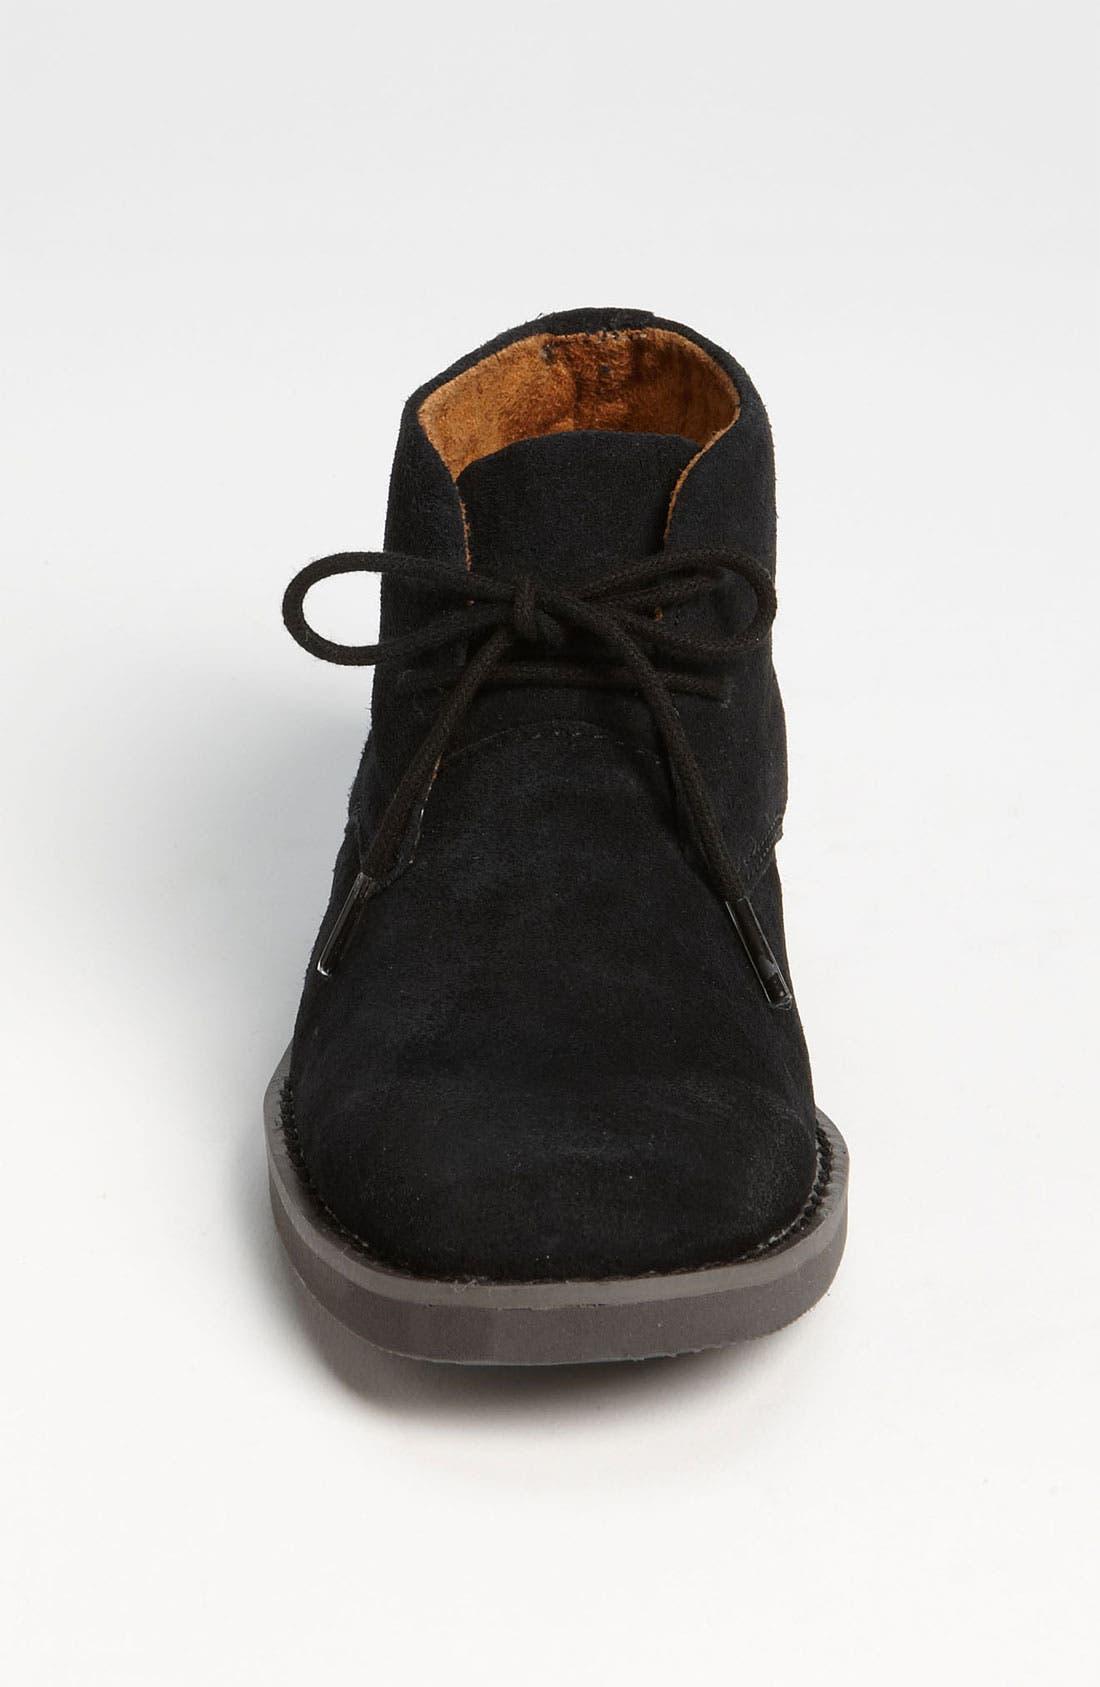 FLORSHEIM,                             'Quinlan' Chukka Boot,                             Alternate thumbnail 8, color,                             001